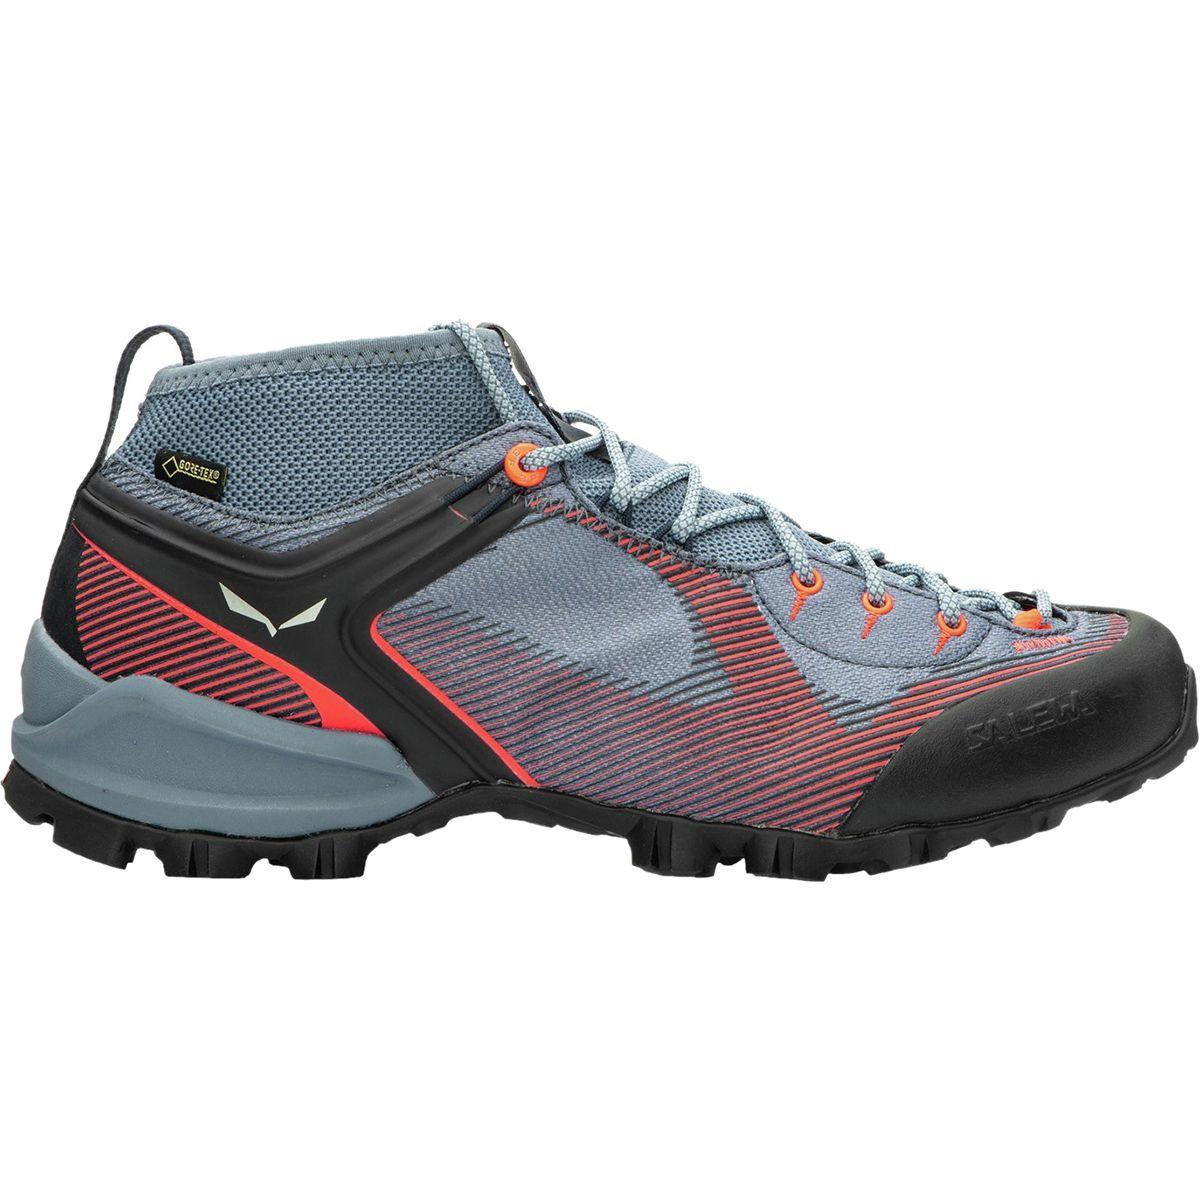 07bd3cb4738 Lyst - Salewa Alpenviolet Gtx Hiking Shoe in Blue